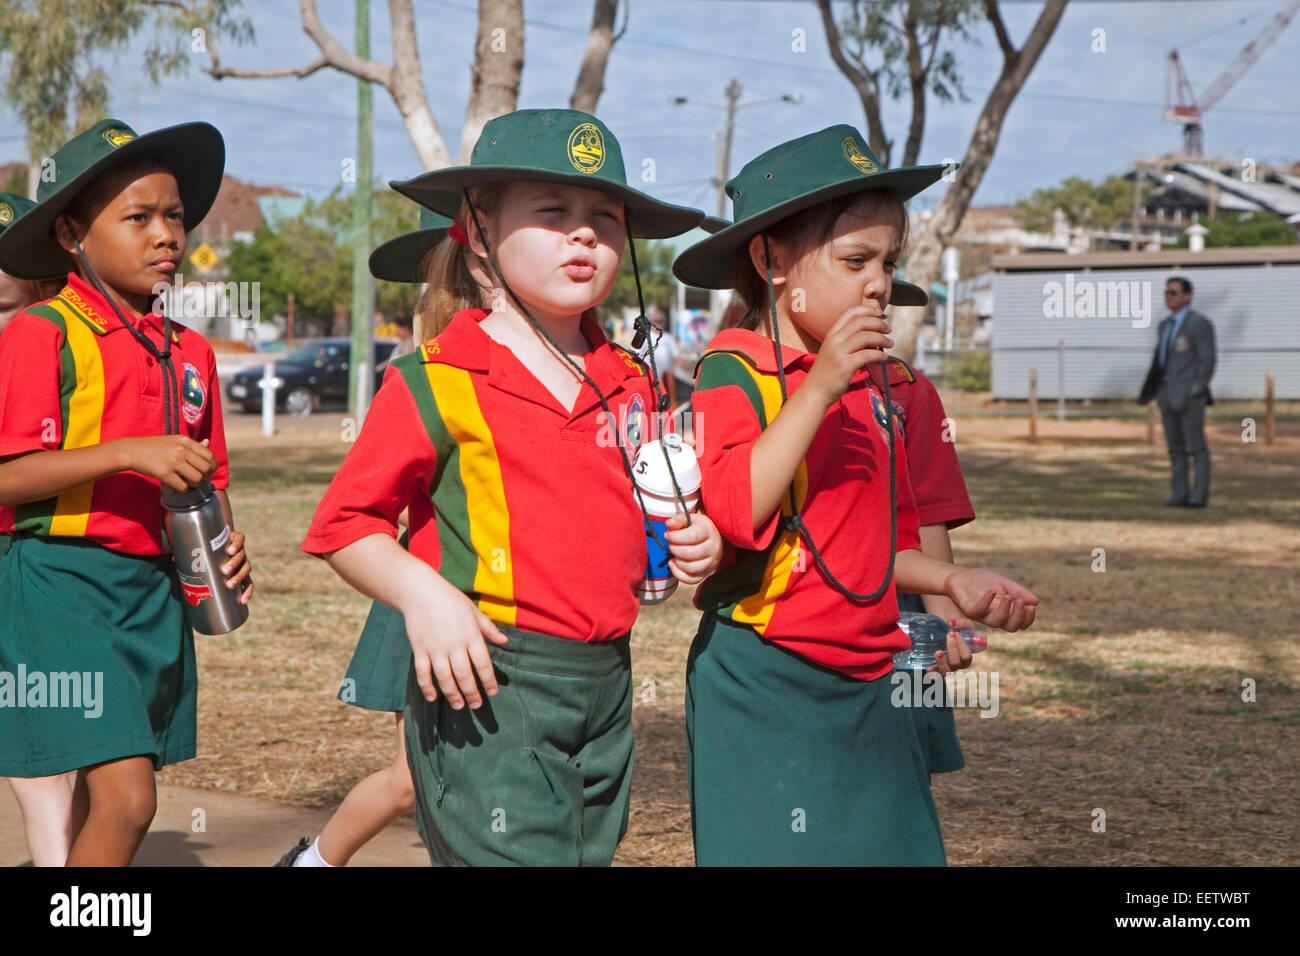 Little girls dressed in school uniforms at Mount Isa, Gulf Country region of Queensland, Australia Stock Photo